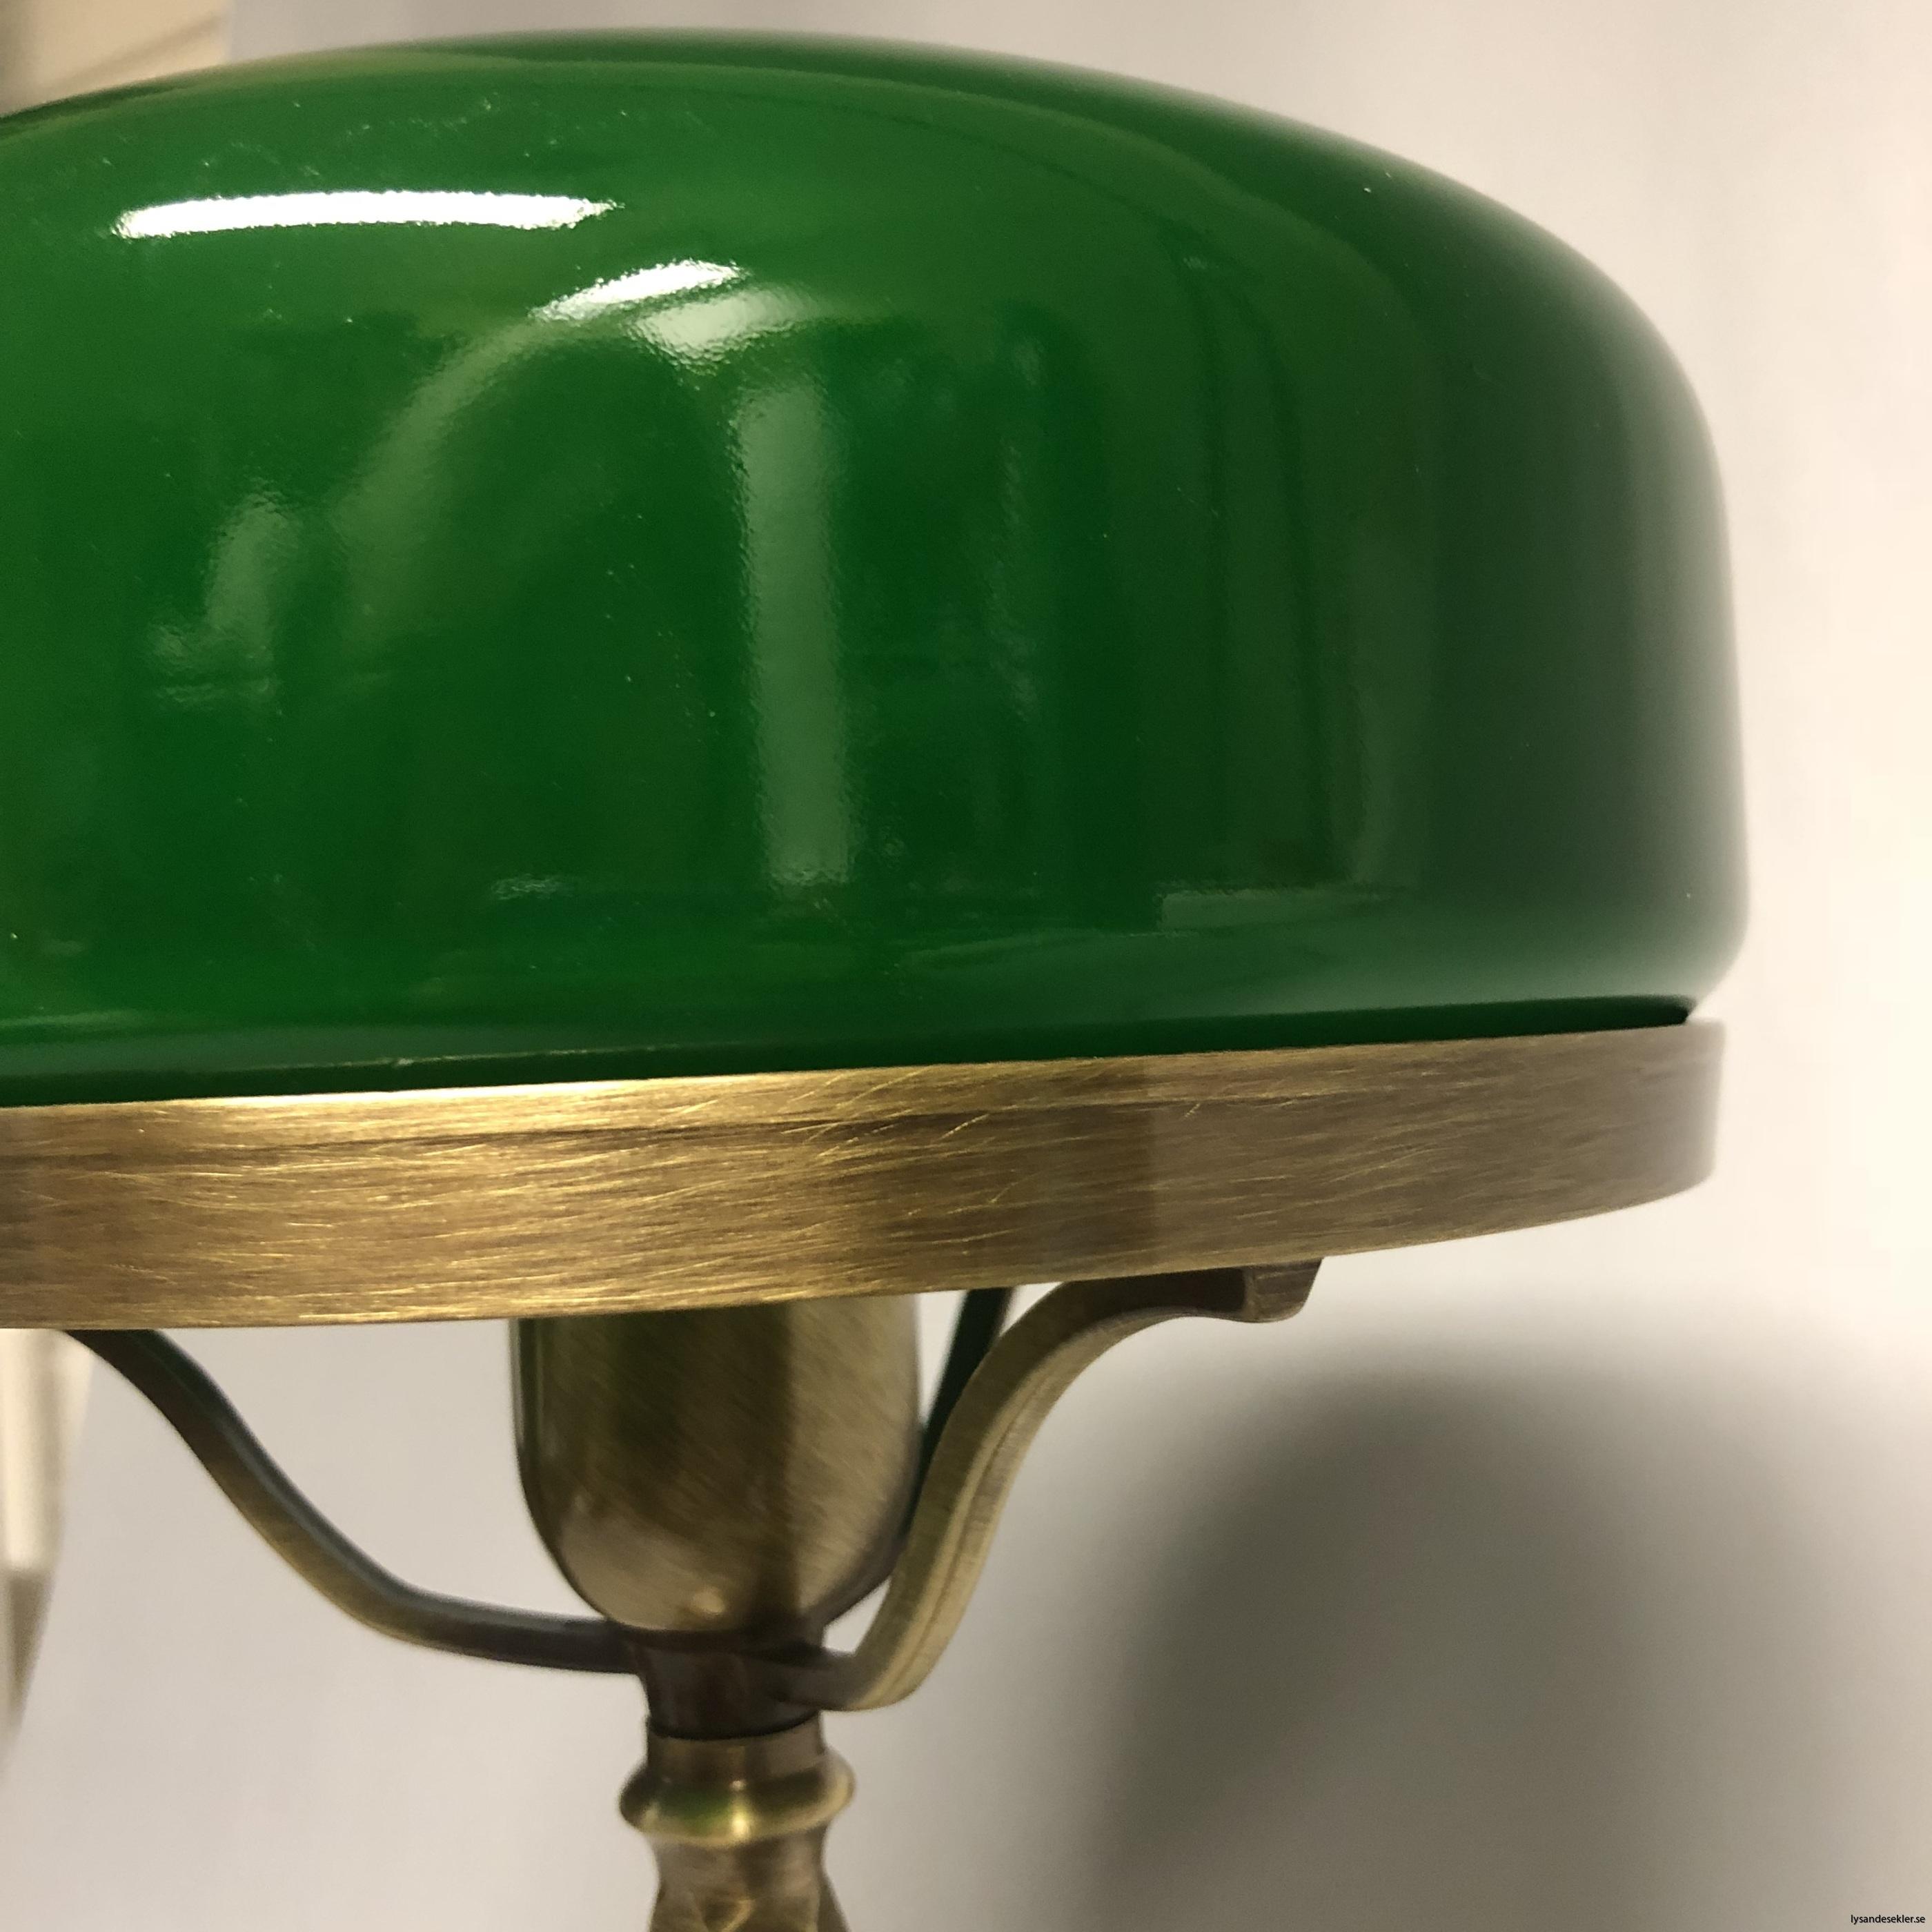 strindbergslampa strindbergslampor strindberg lampa skärm kupa strindbergsskärm strindbergskupa40